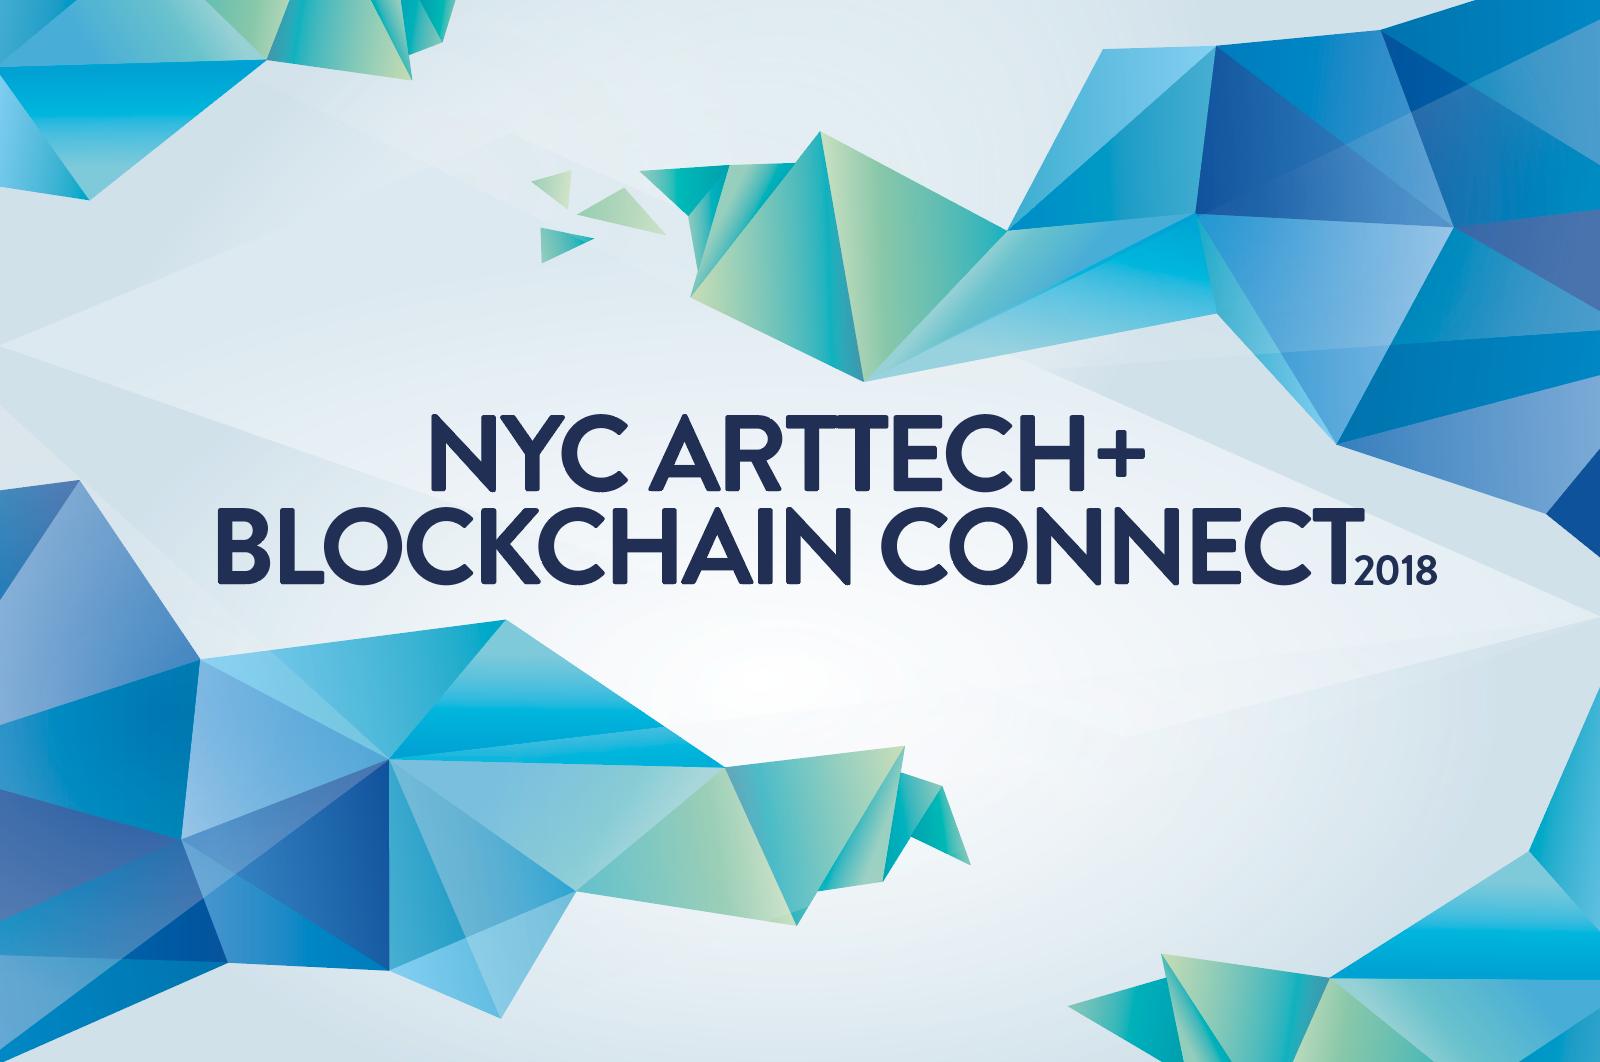 NYC ArtTech + Blockchain Connect 2018